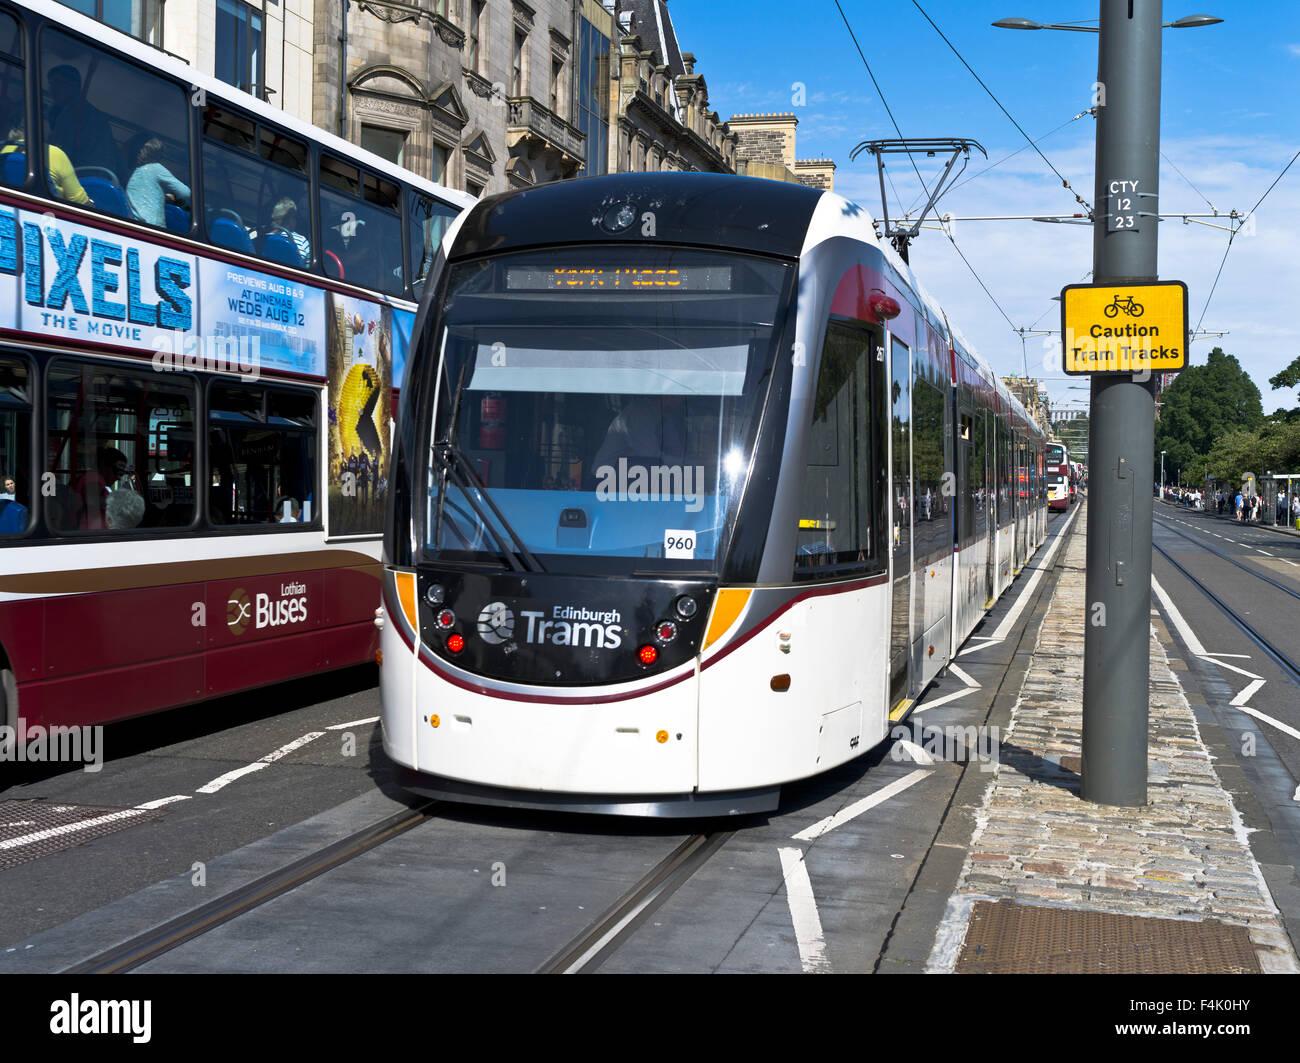 Dh PRINCES STREET EDINBURGH Edinburgh Modern Tram Travel Trams Uk Cars